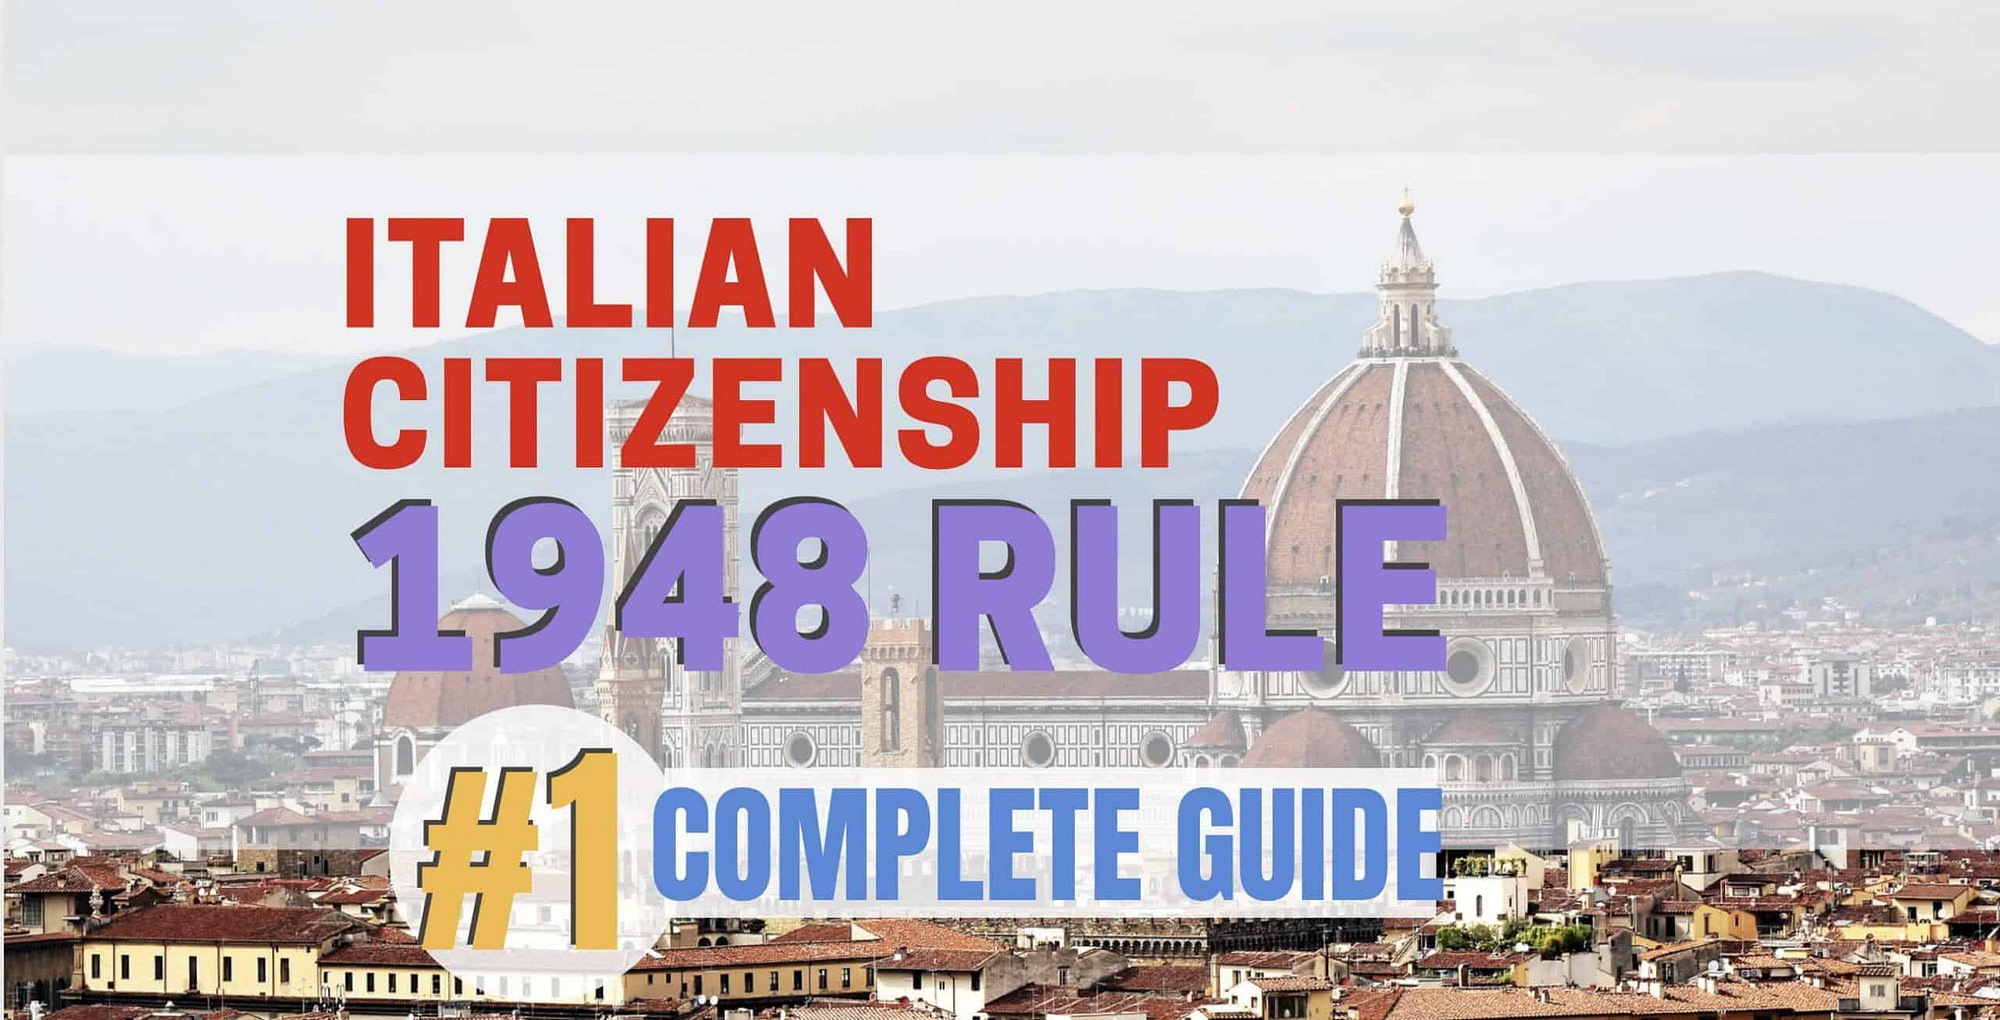 italian-citizenship-1948-rule-maternal-line-italian-citizenship-maternal-line-italian-citizenship-1948-case-italian-citizenship-through-female-italian-citizeship-jure-sanguinis-boost-italian-citizenship-by-descent-italian-citizenship-processing-time-speed-up-italian-citizenship-by-descent-processing-time-italian-citizenship-assistance-italian-dual-citizenship-lawyer-italian-citizenship-service-italian-citizenship-jure-sanguinis-assistance-boost-italian-citizenship-processing-time